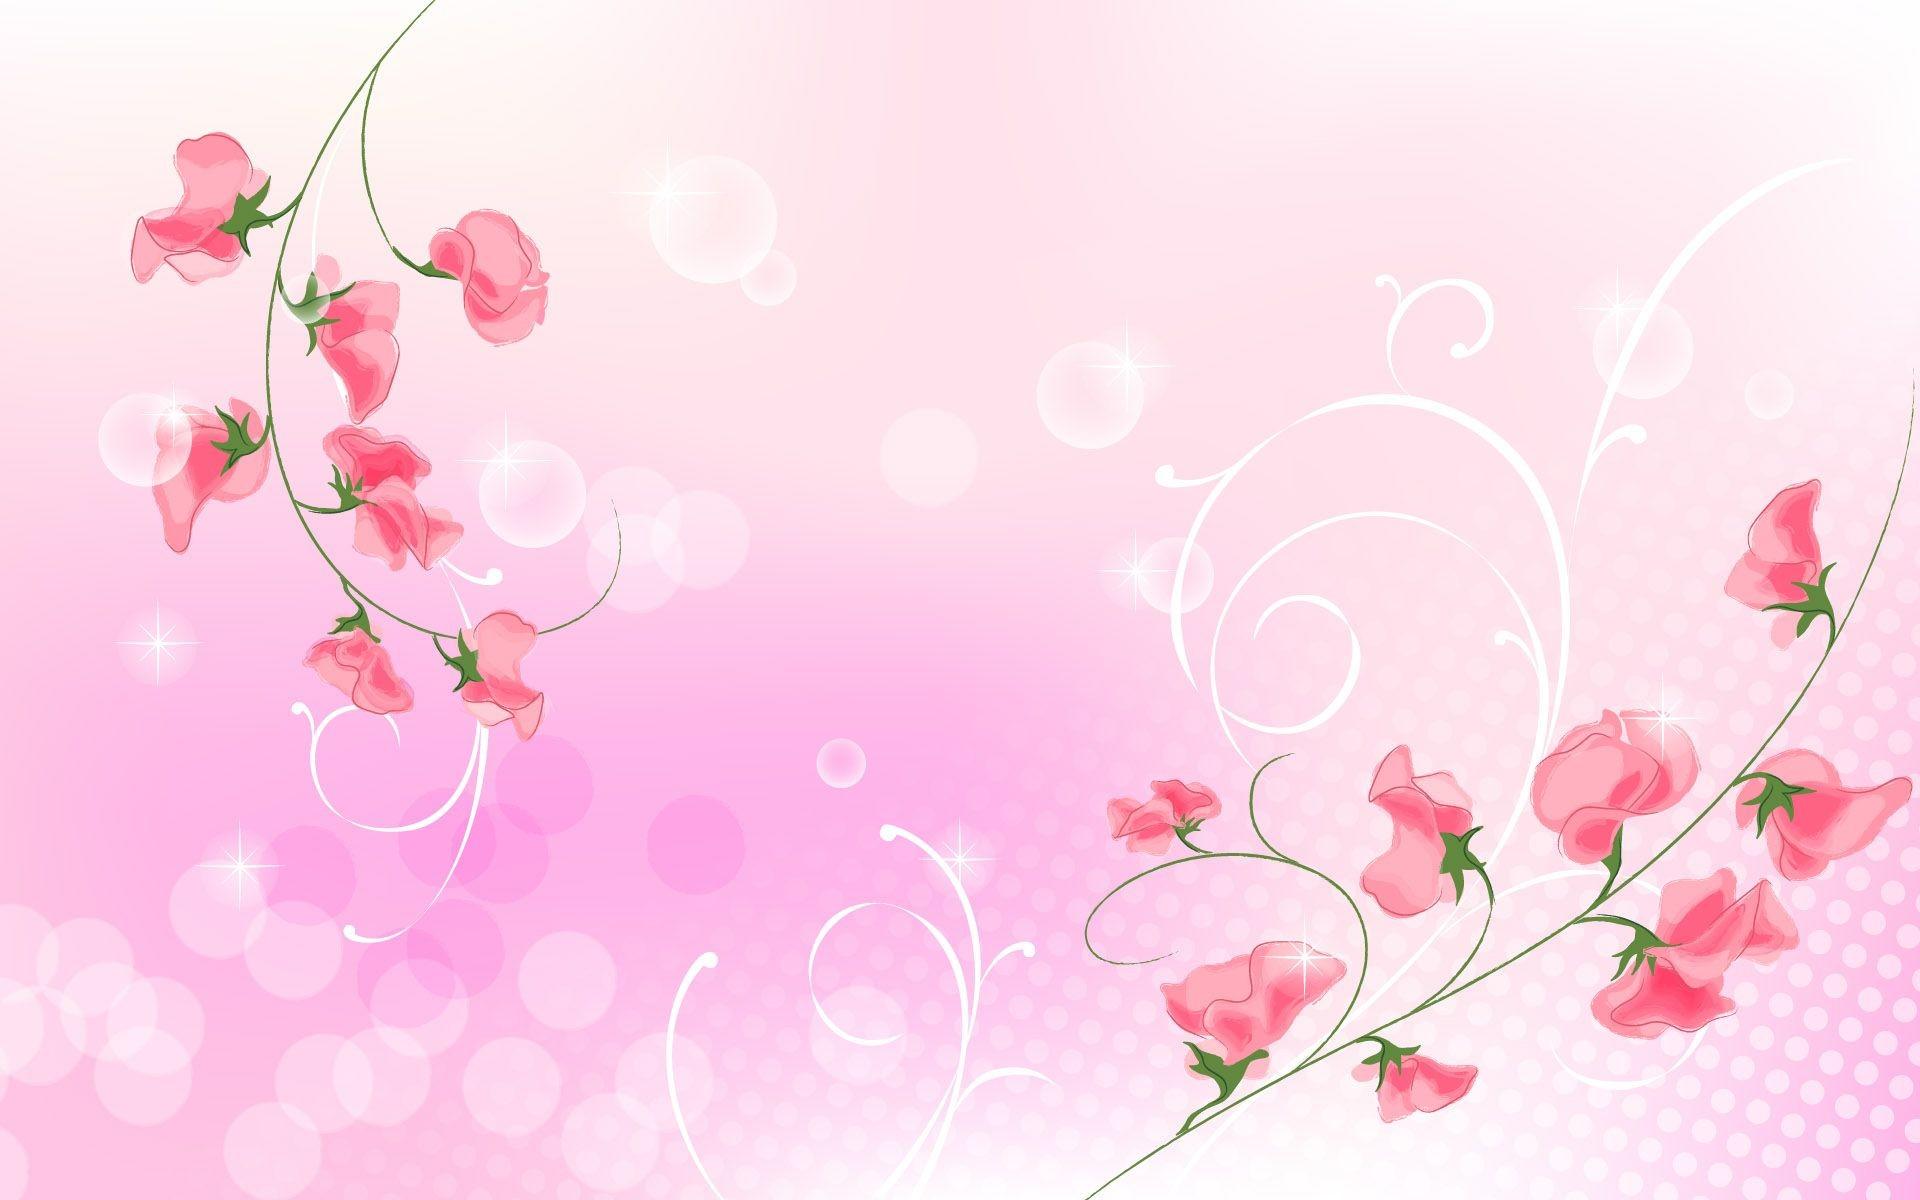 Popular Wallpaper High Resolution Wedding - 1128673-download-free-hd-wedding-backgrounds-1920x1200  Graphic_963182.jpg